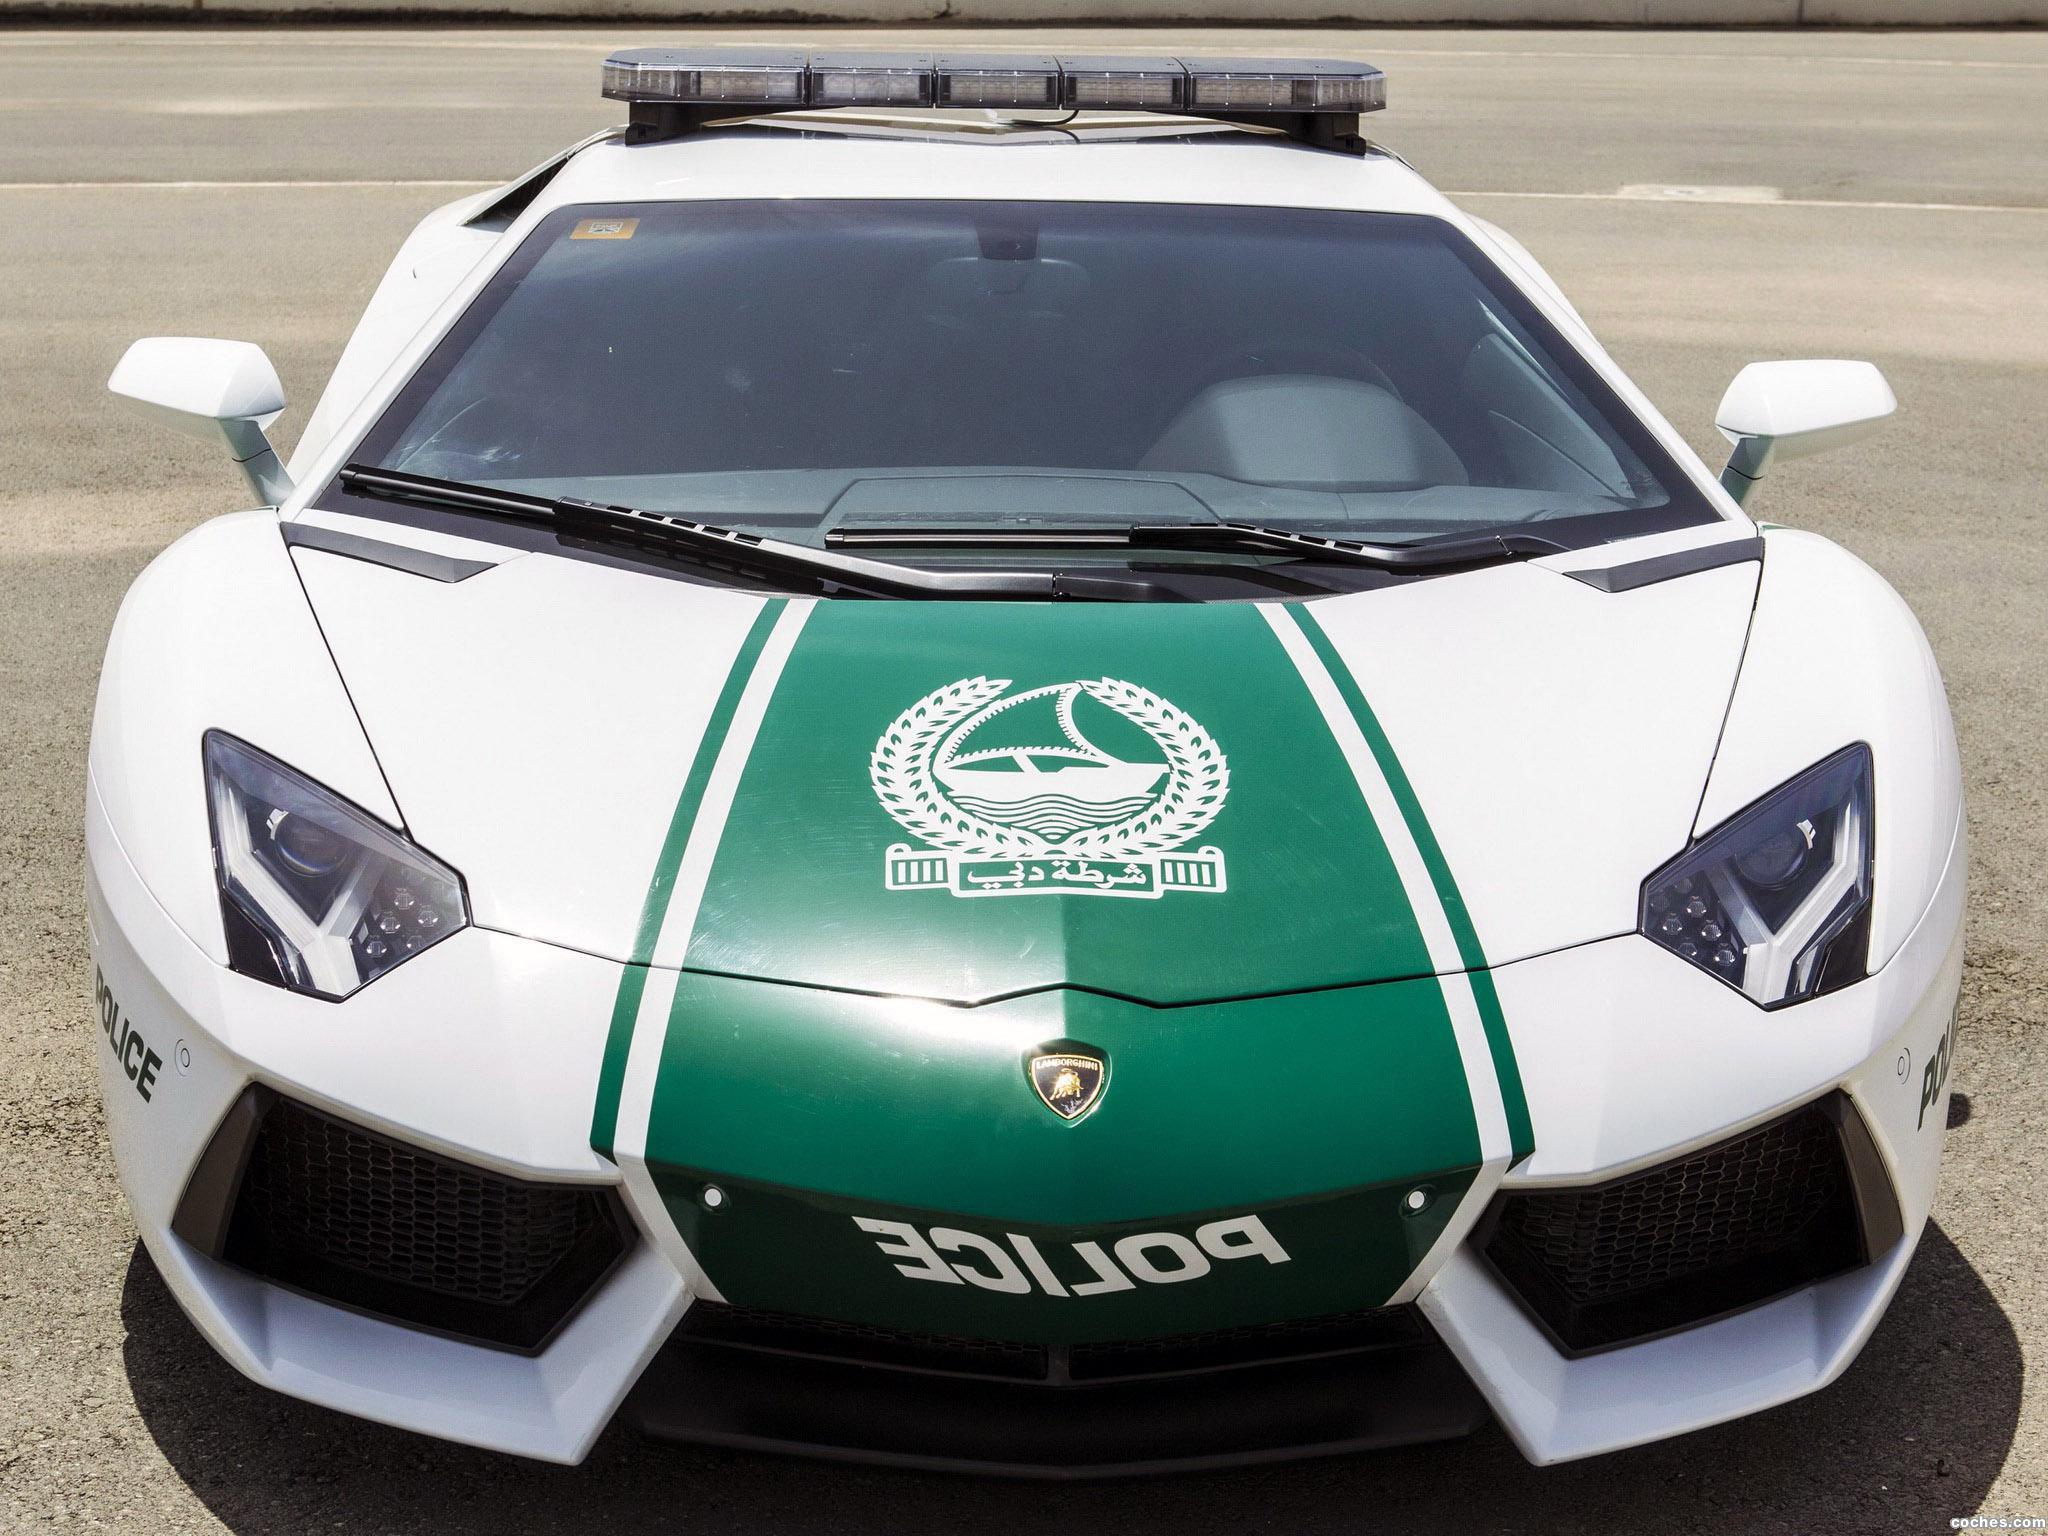 Foto 0 de Lamborghini Aventador Dubai Police Car 2014